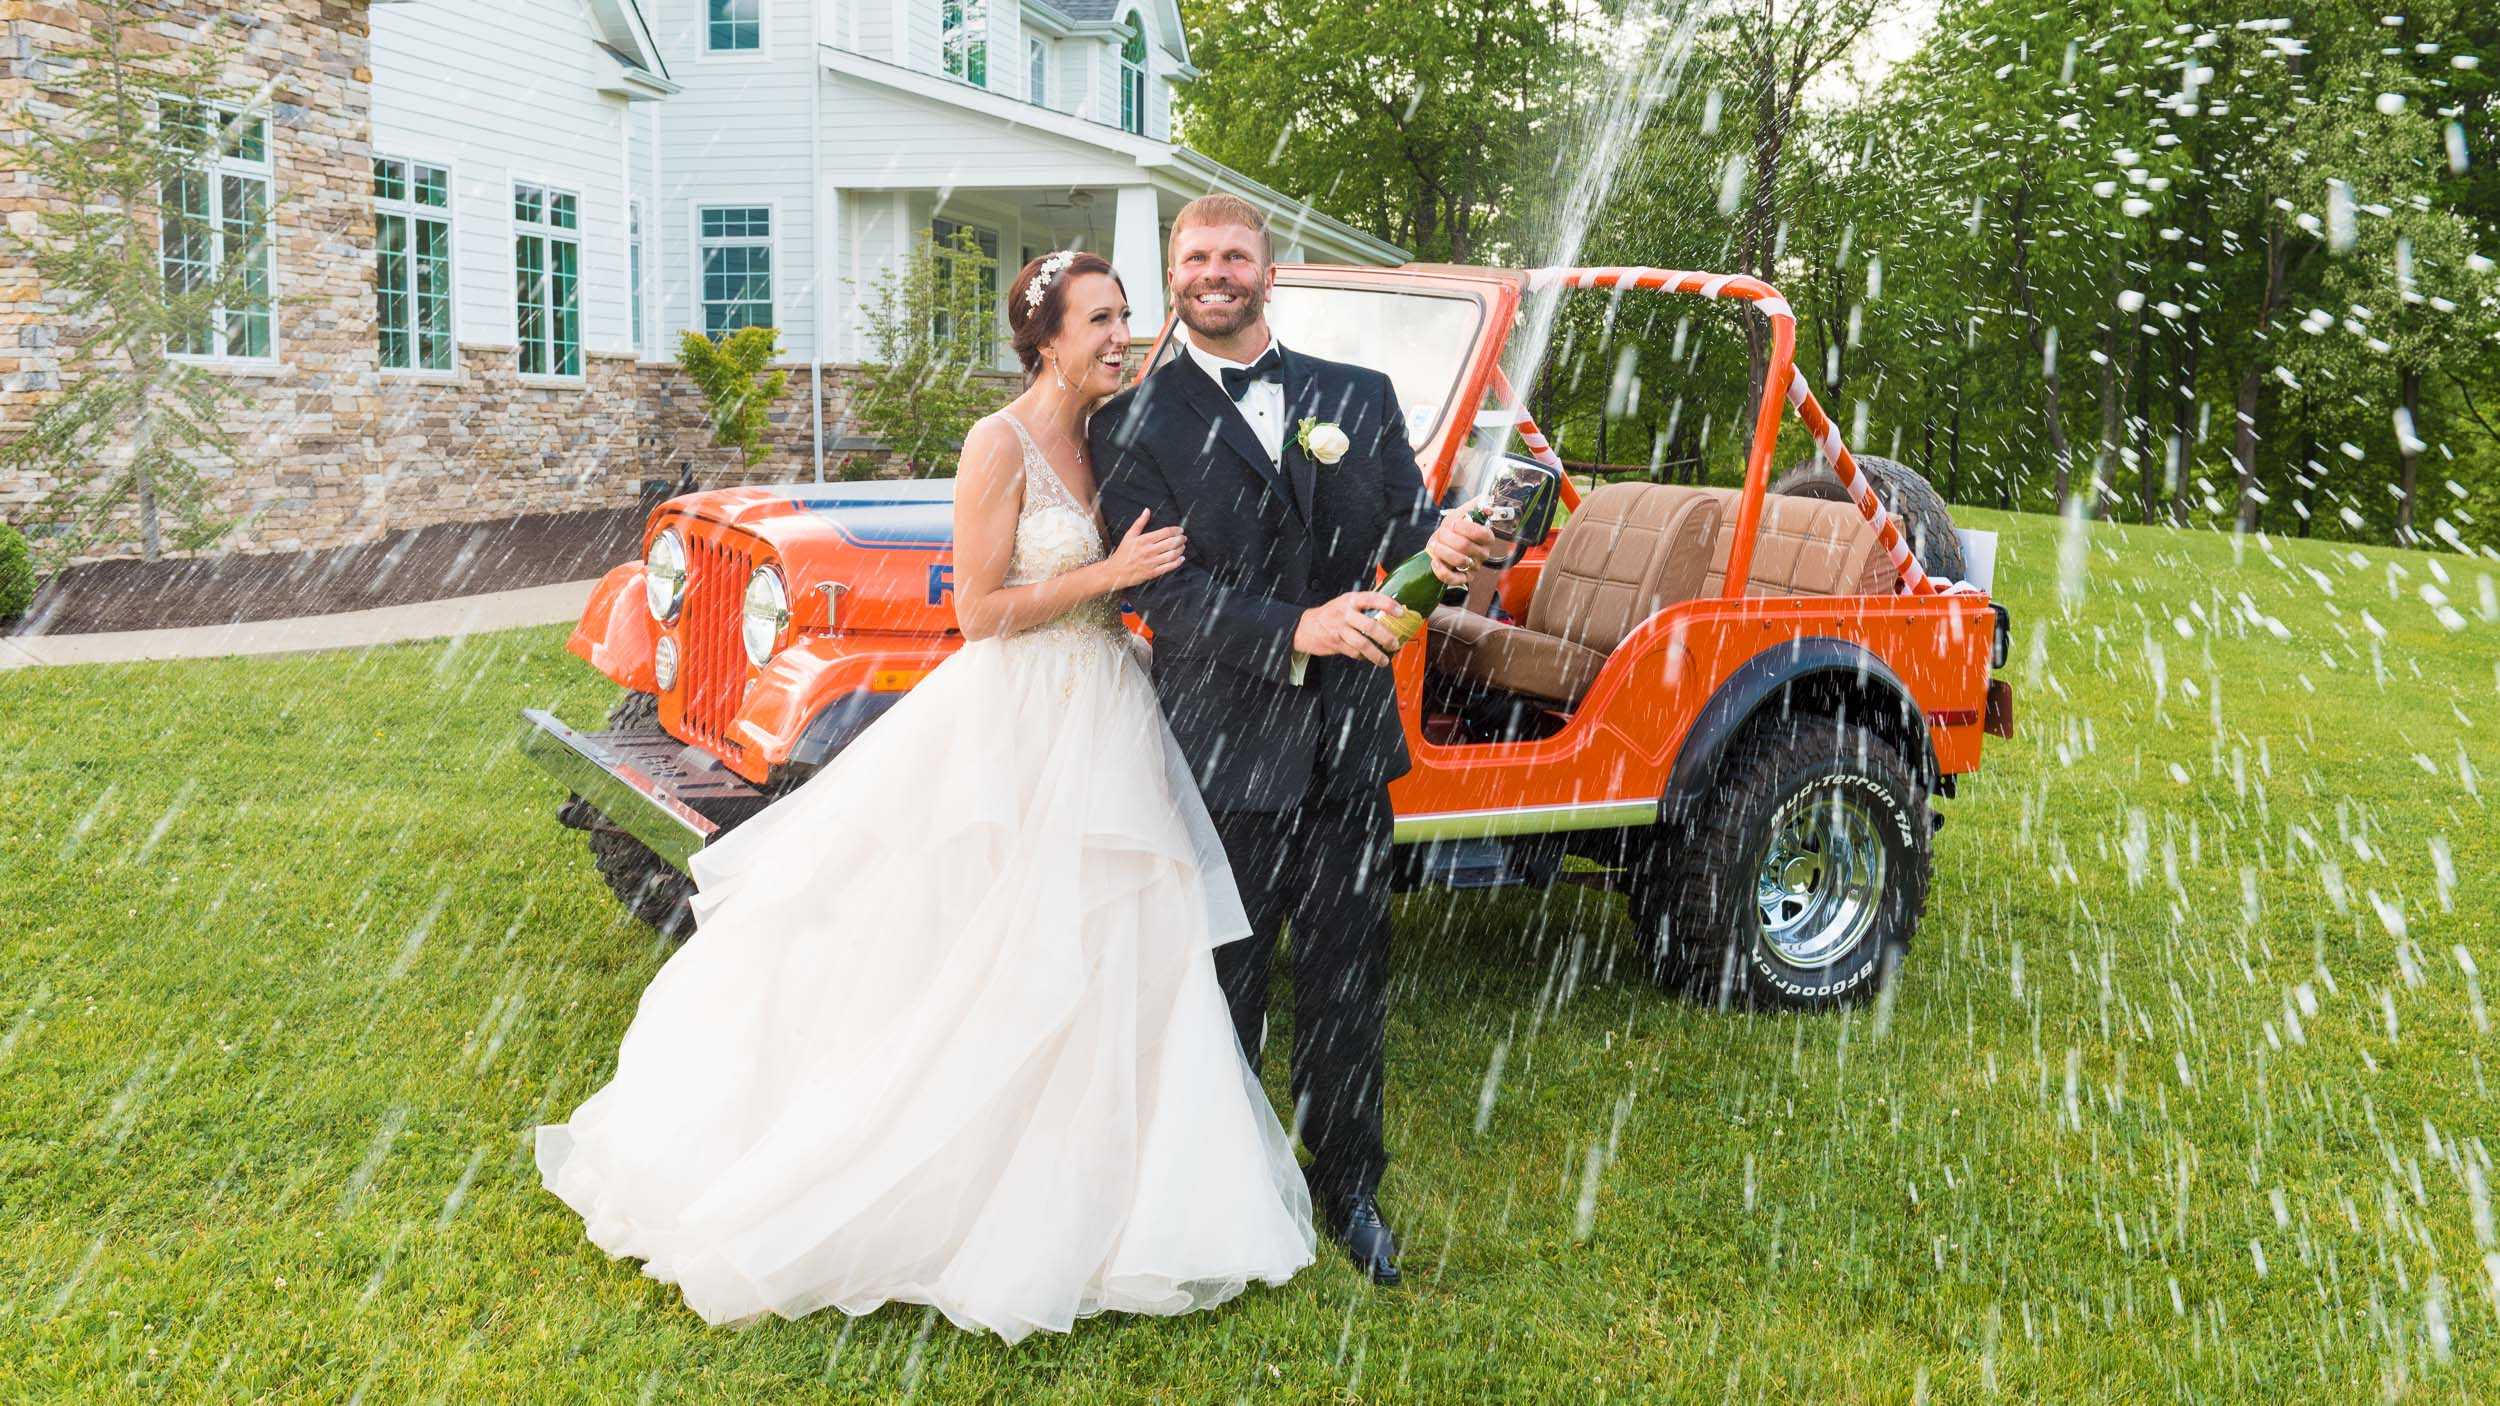 Bride-and-groom-champagne-blast-orange-jeep.jpg